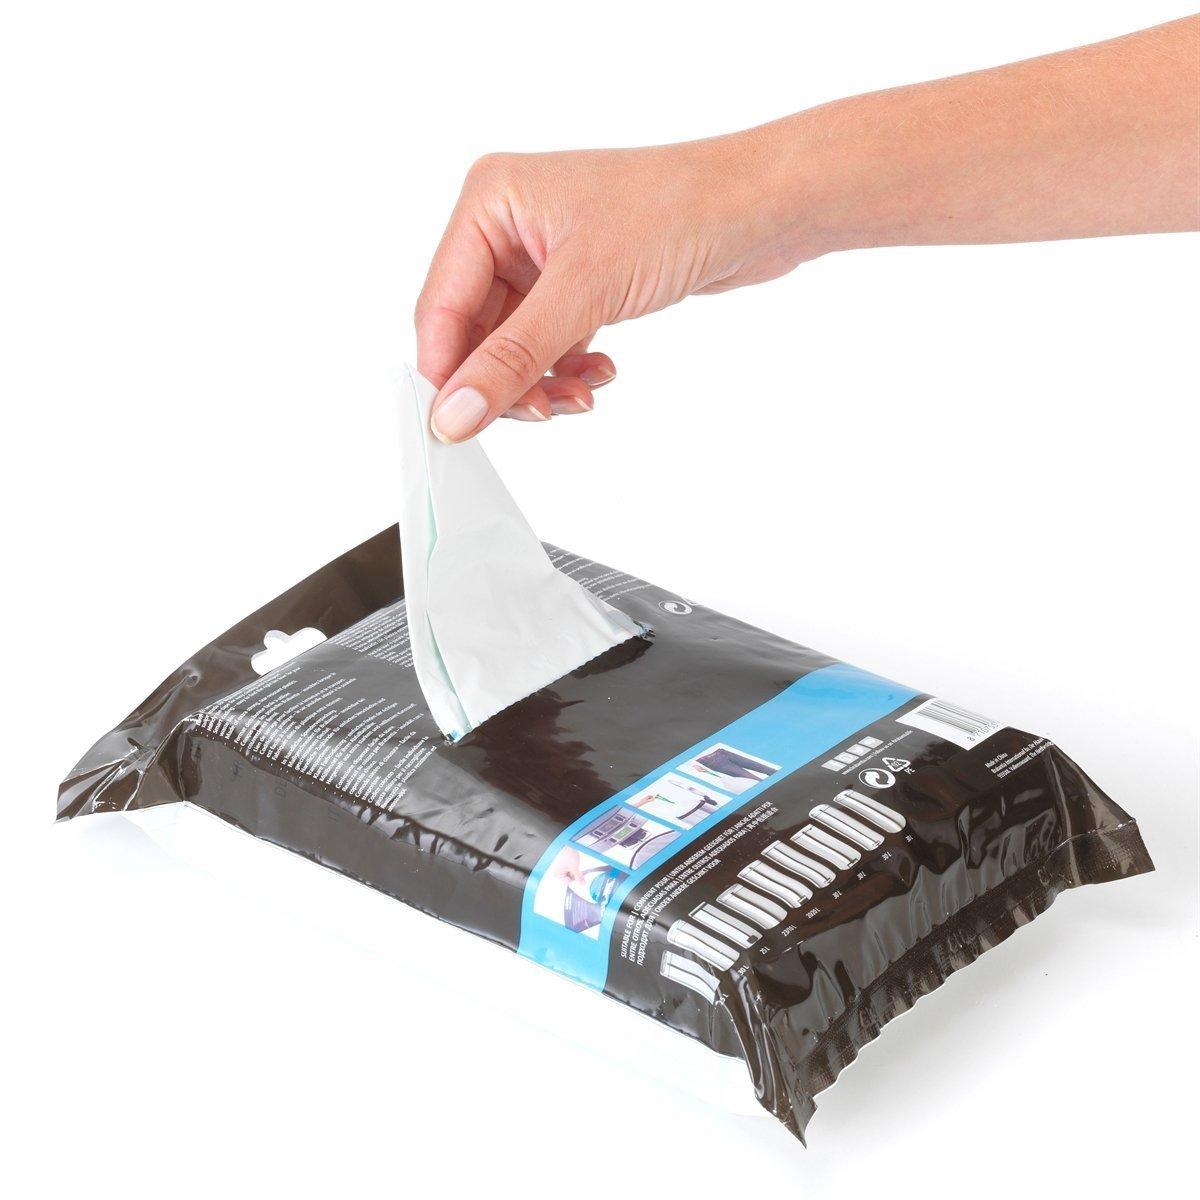 Brabantia dispensador de Bolsas de Basura del Paquete 30 L (g) 40 Unidades, 2 Pack: Amazon.es: Hogar